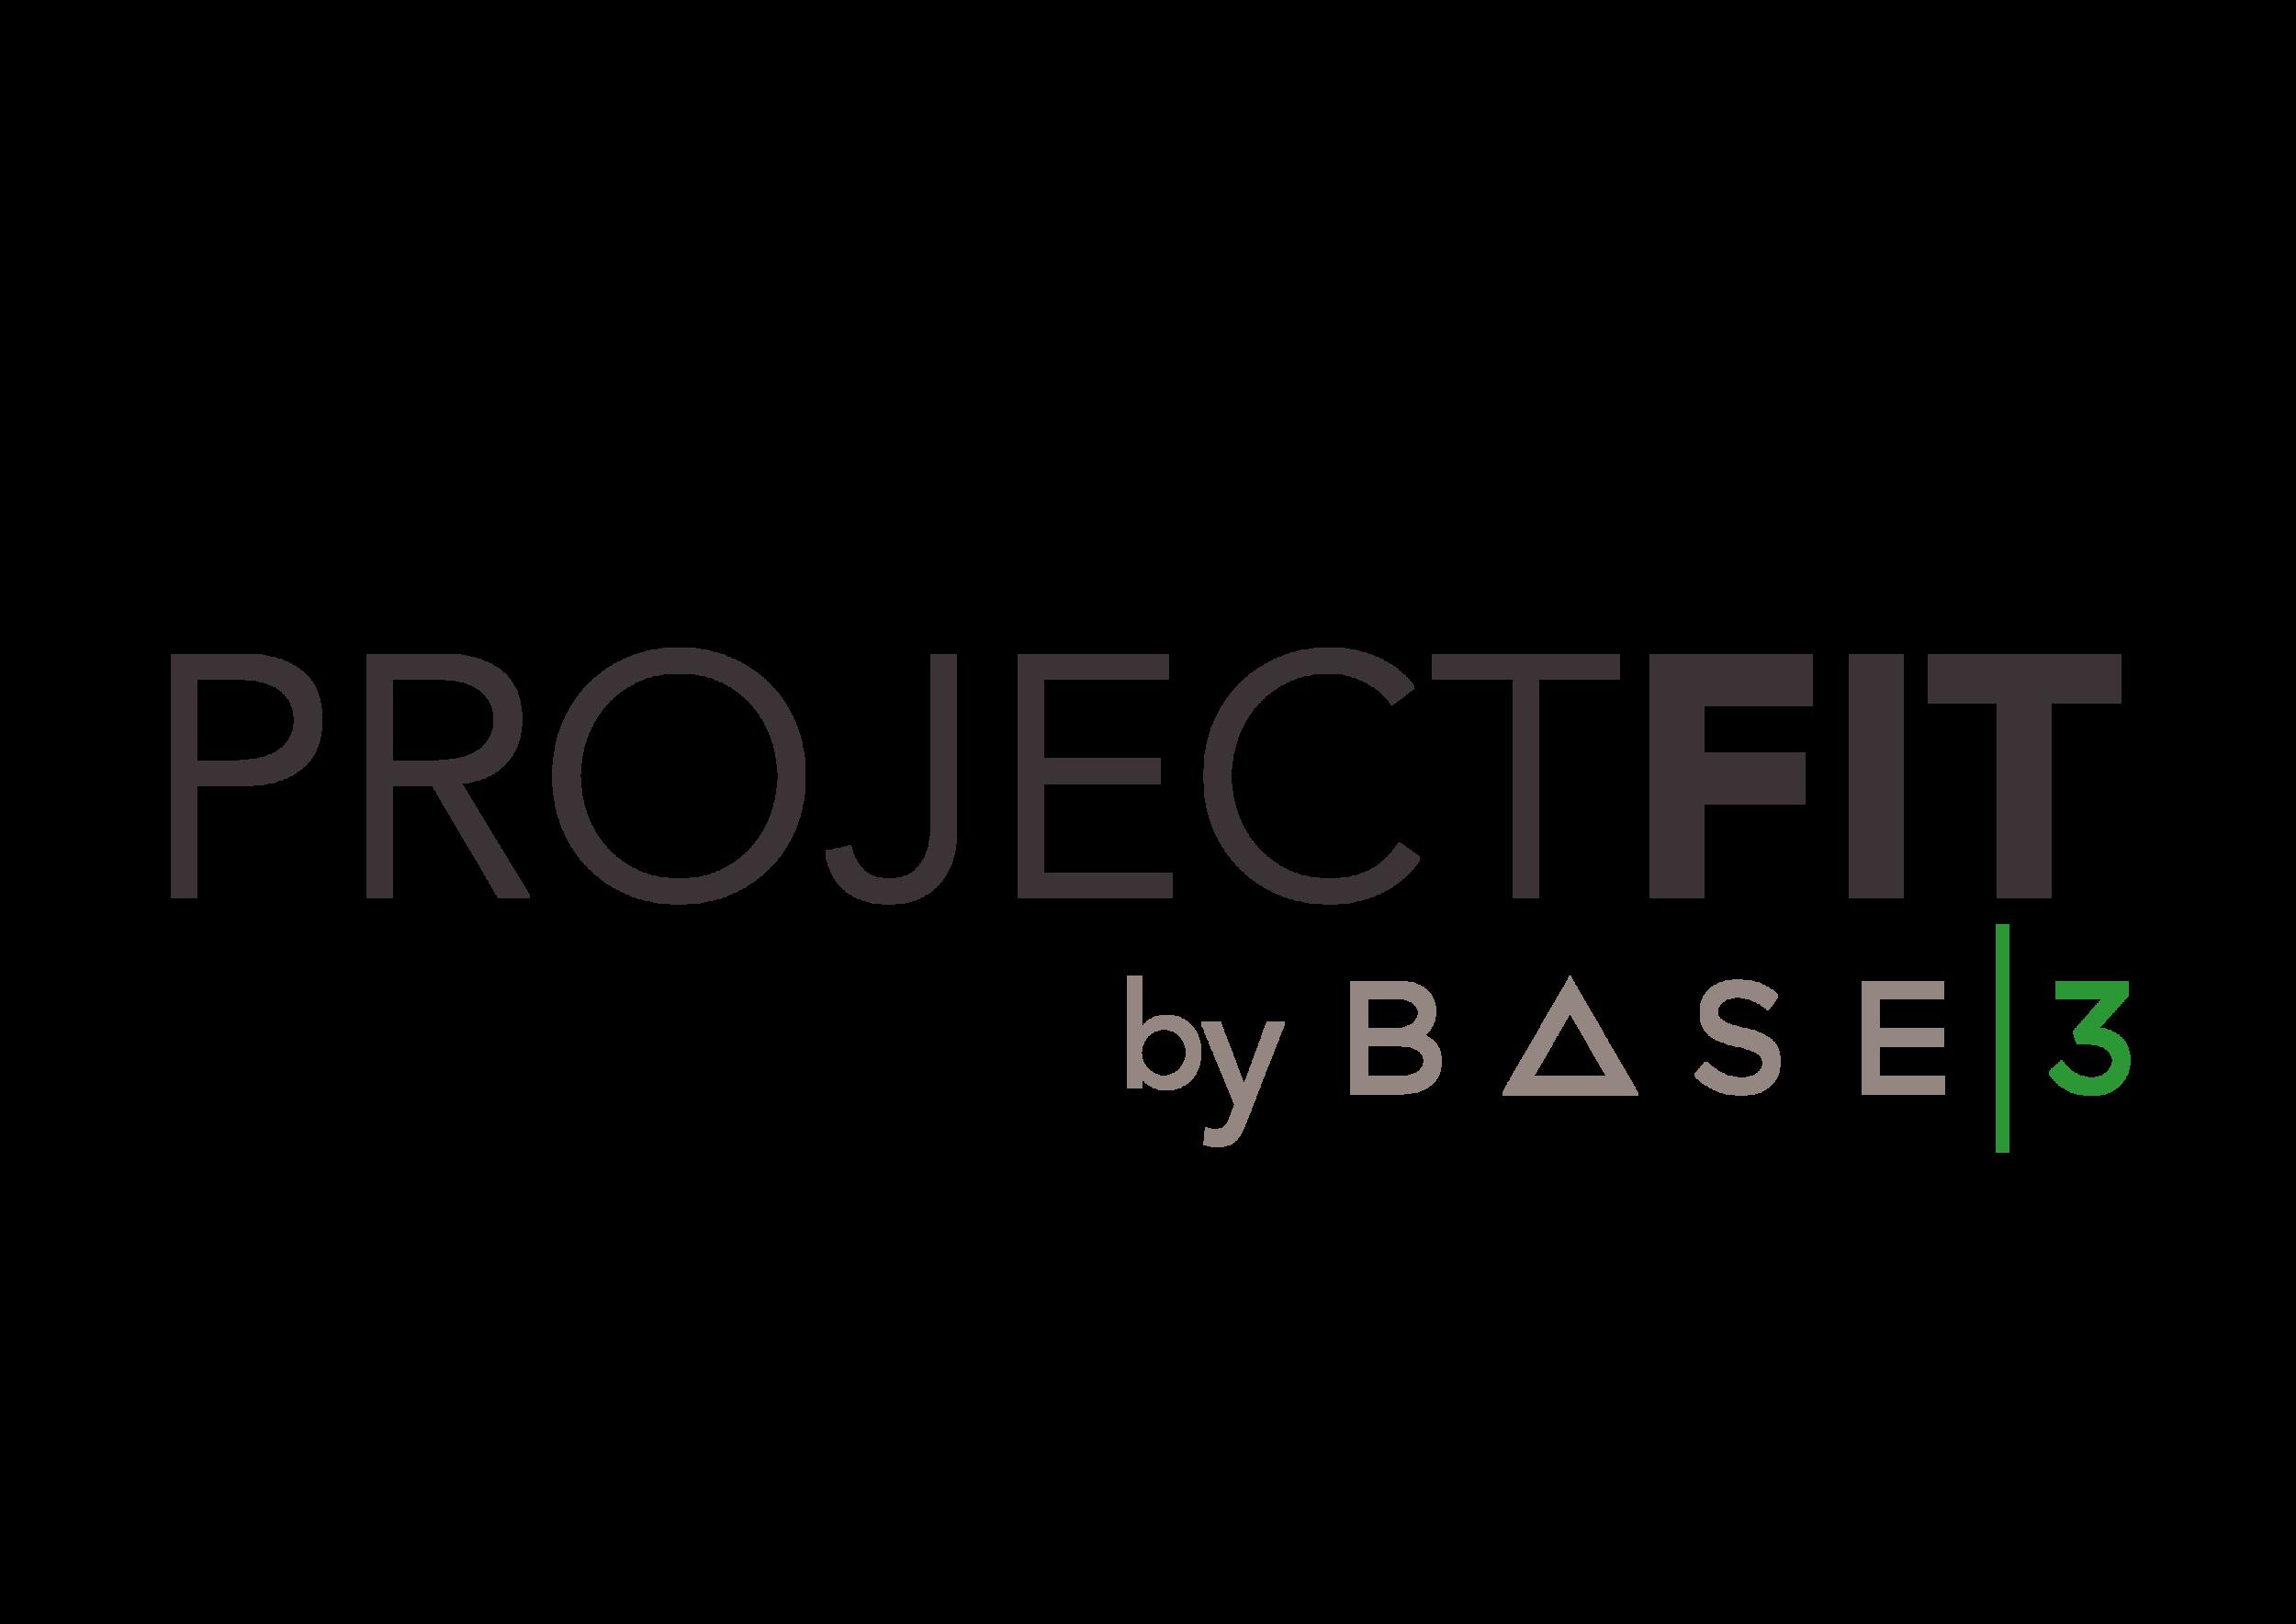 B3068_FIT logo-01.png